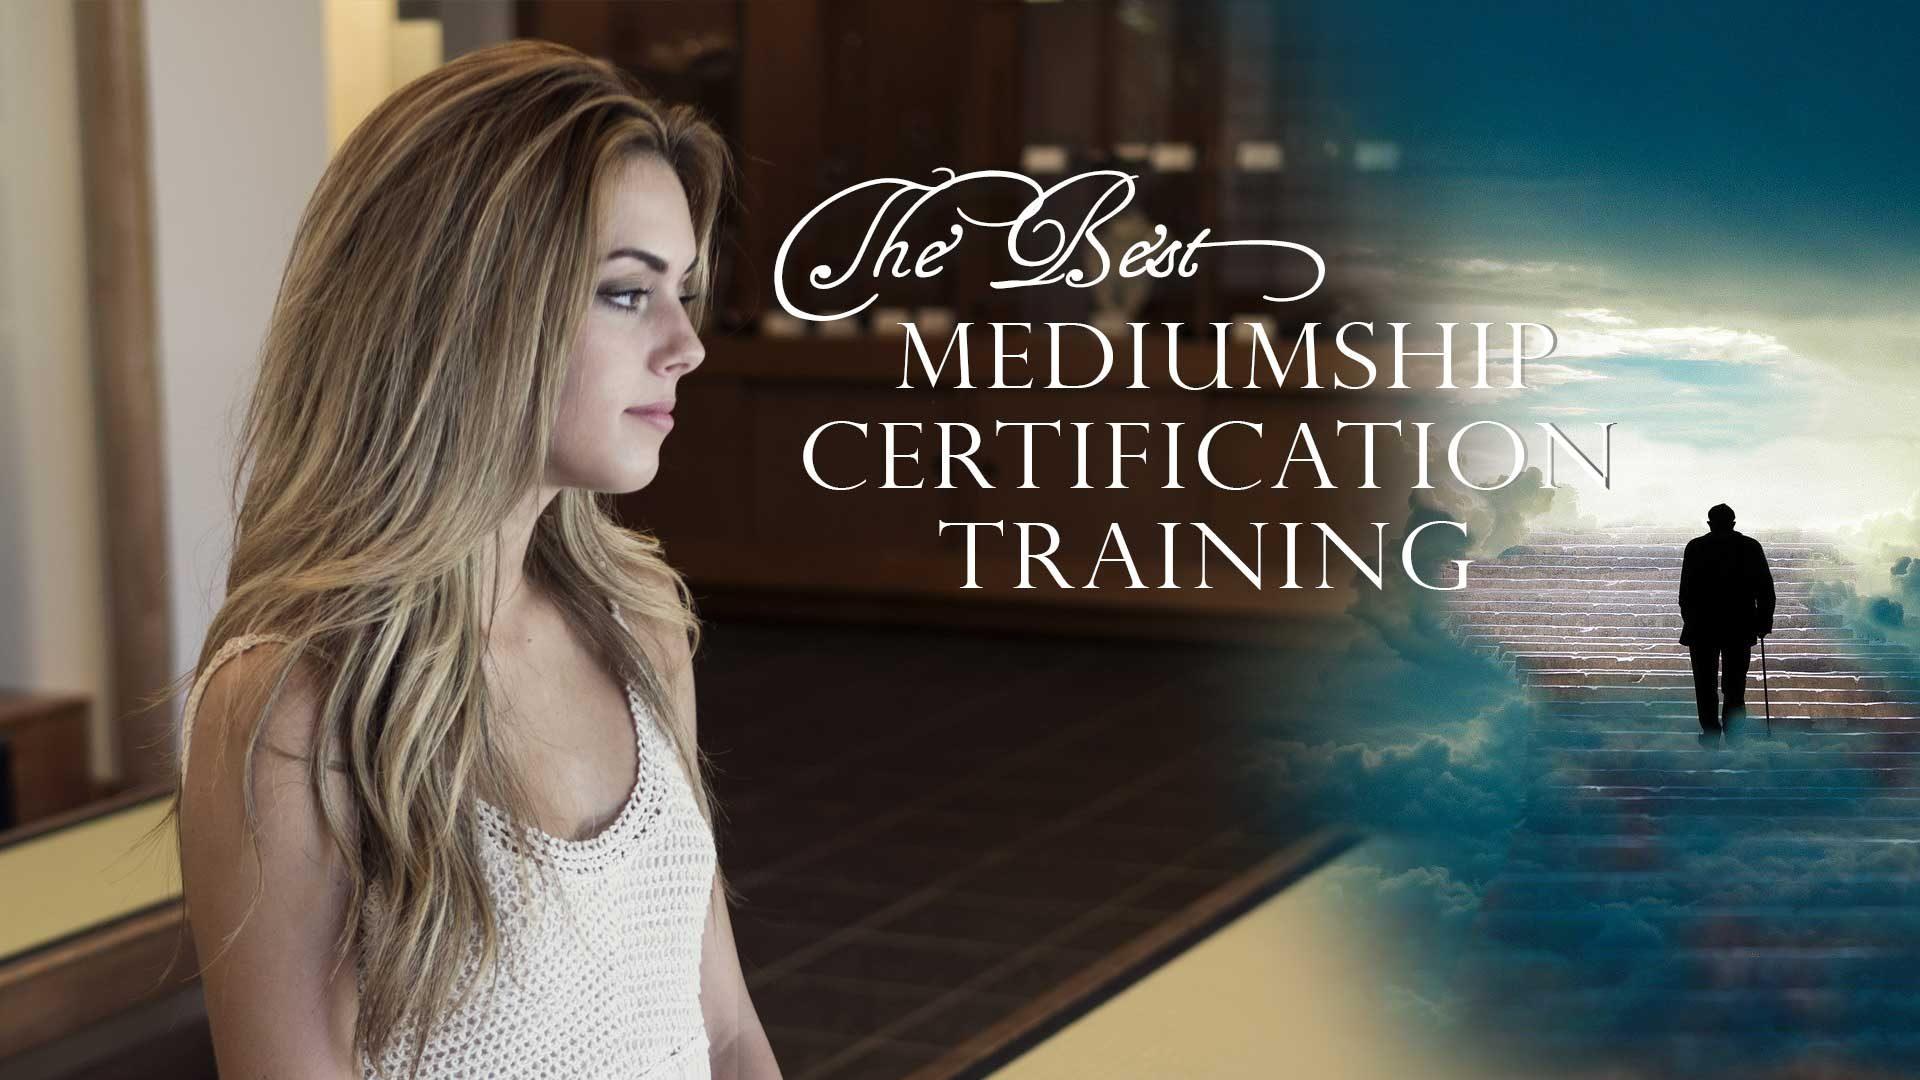 The Best-Mediumship-Certificatio-Training